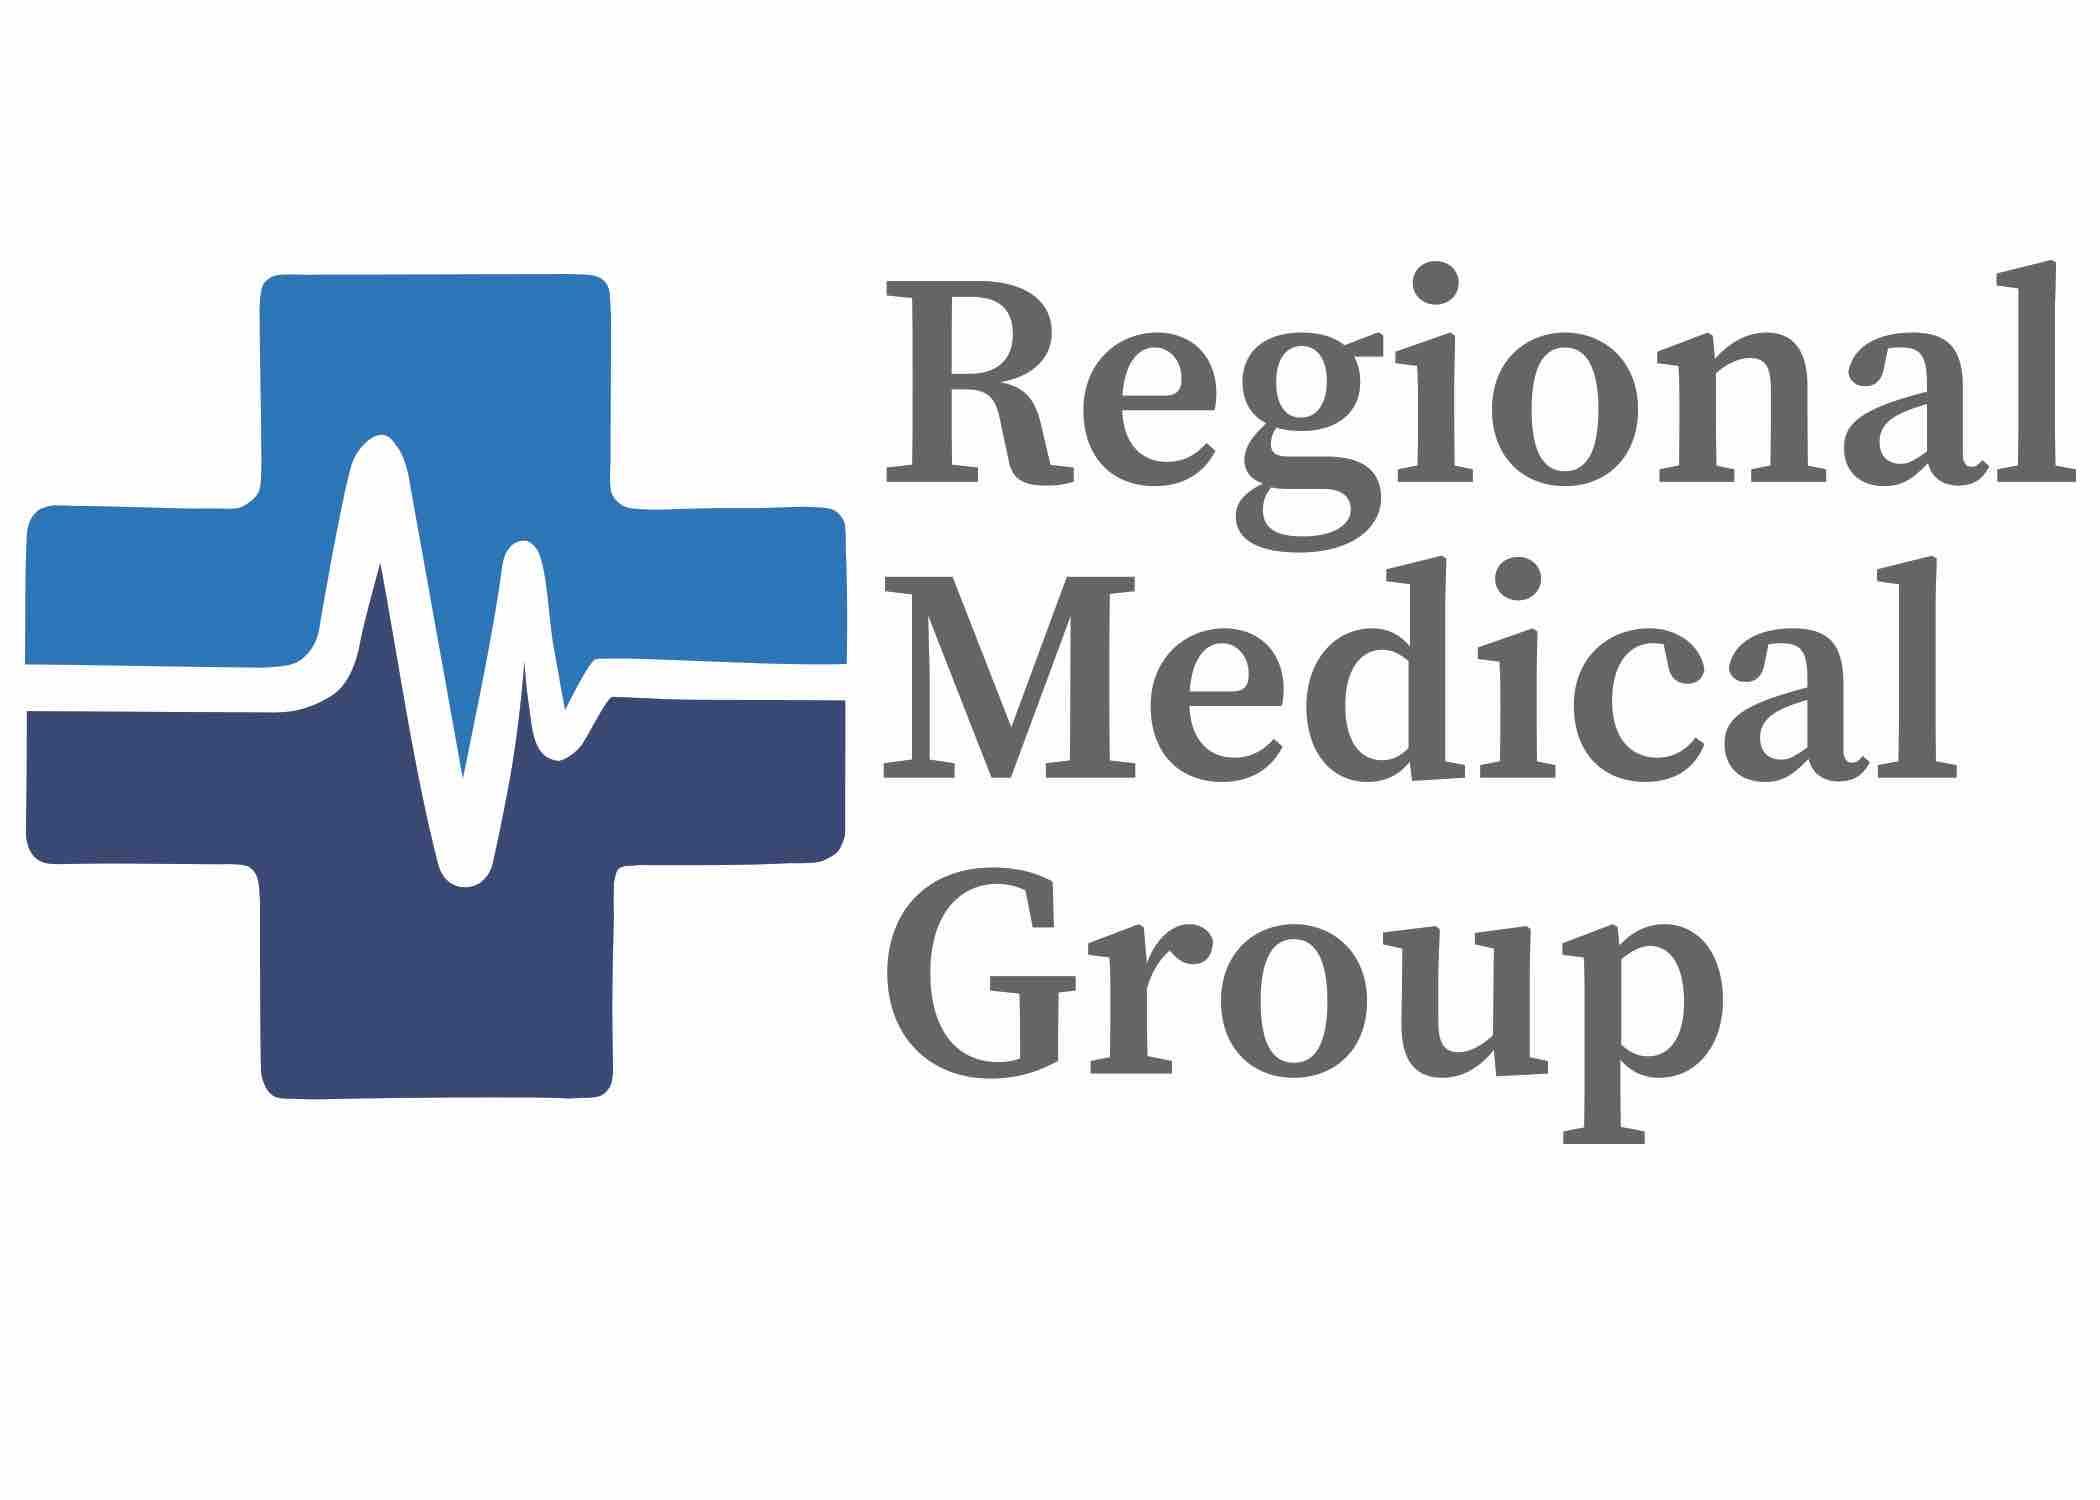 Regional Medical Group Announces Women's History Month Initiative Celebration